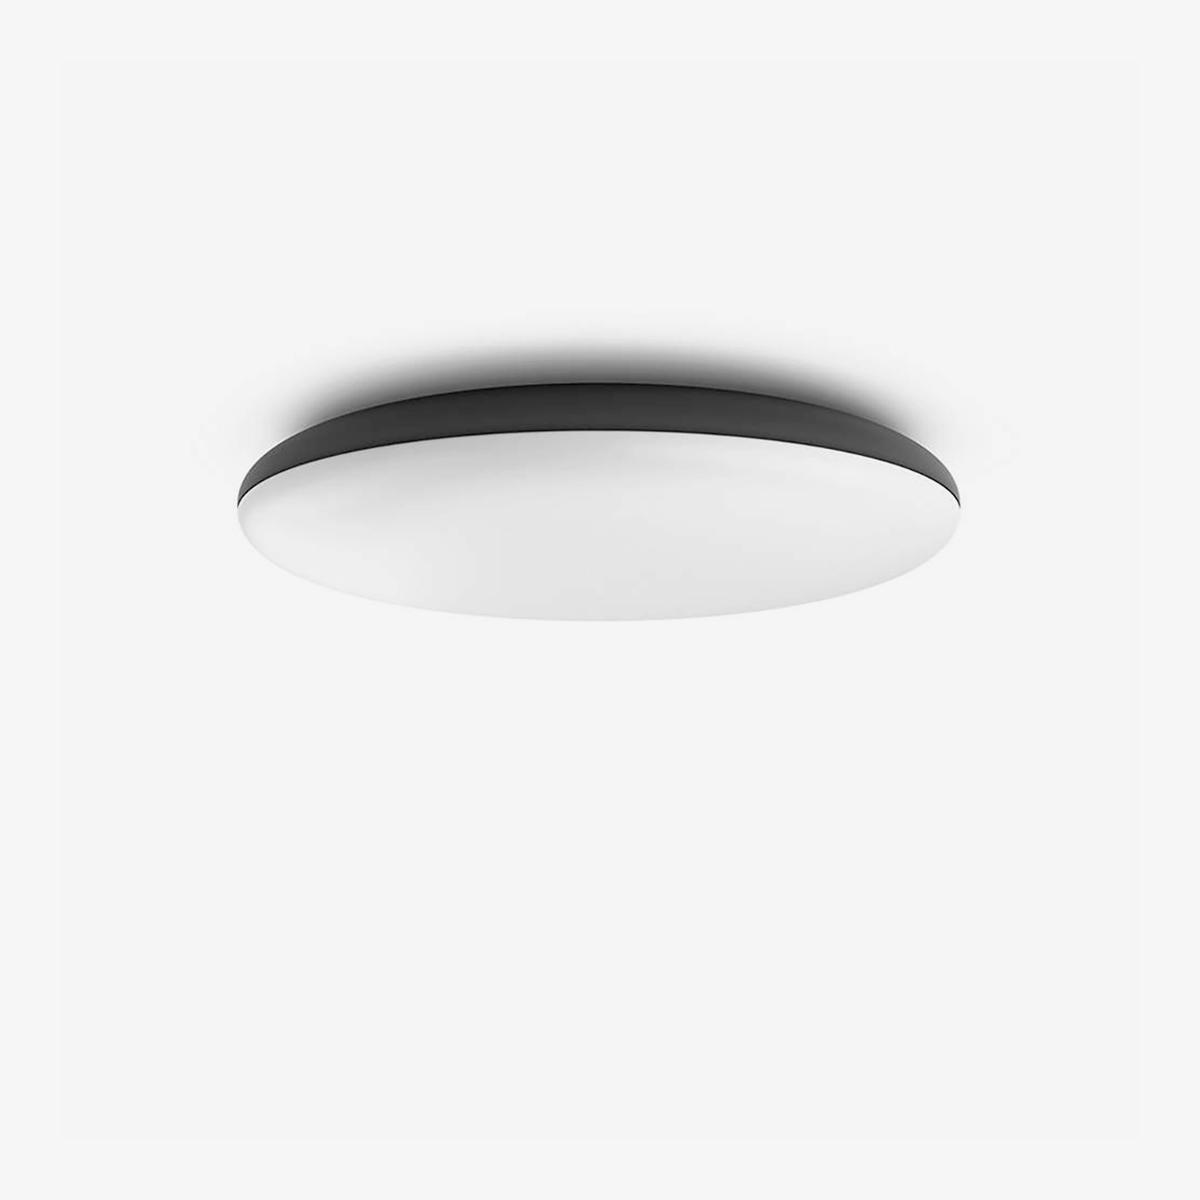 Lámpara de techo plafón Cher negro Philips Hue-0